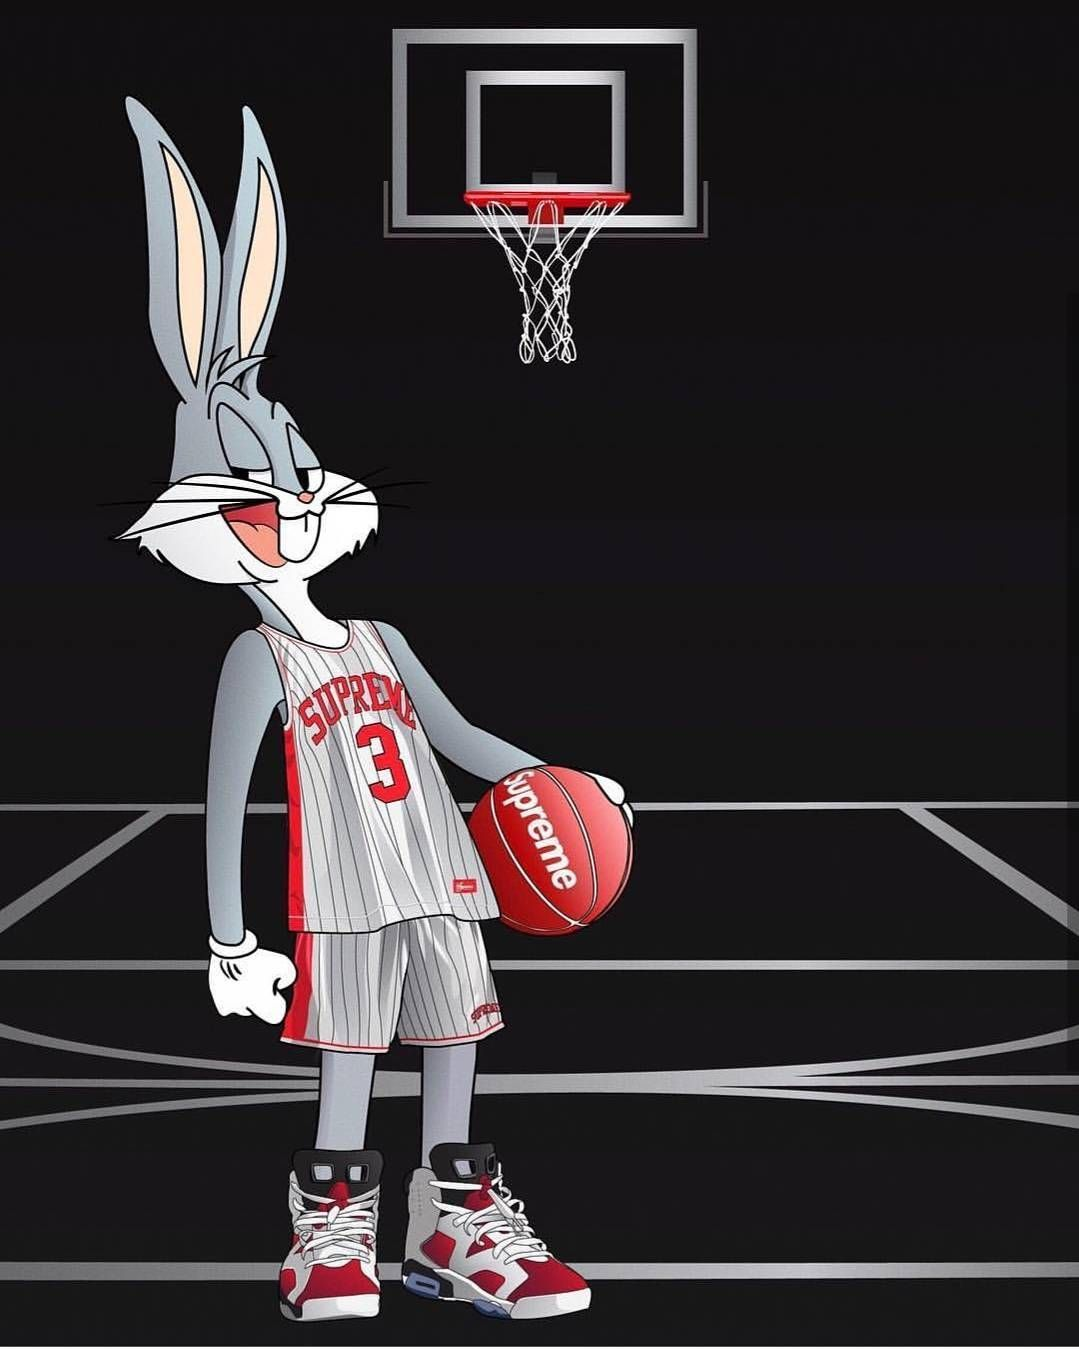 Bugs Bunny Basketball Wallpapers Top Free Bugs Bunny Basketball Backgrounds Wallpaperaccess